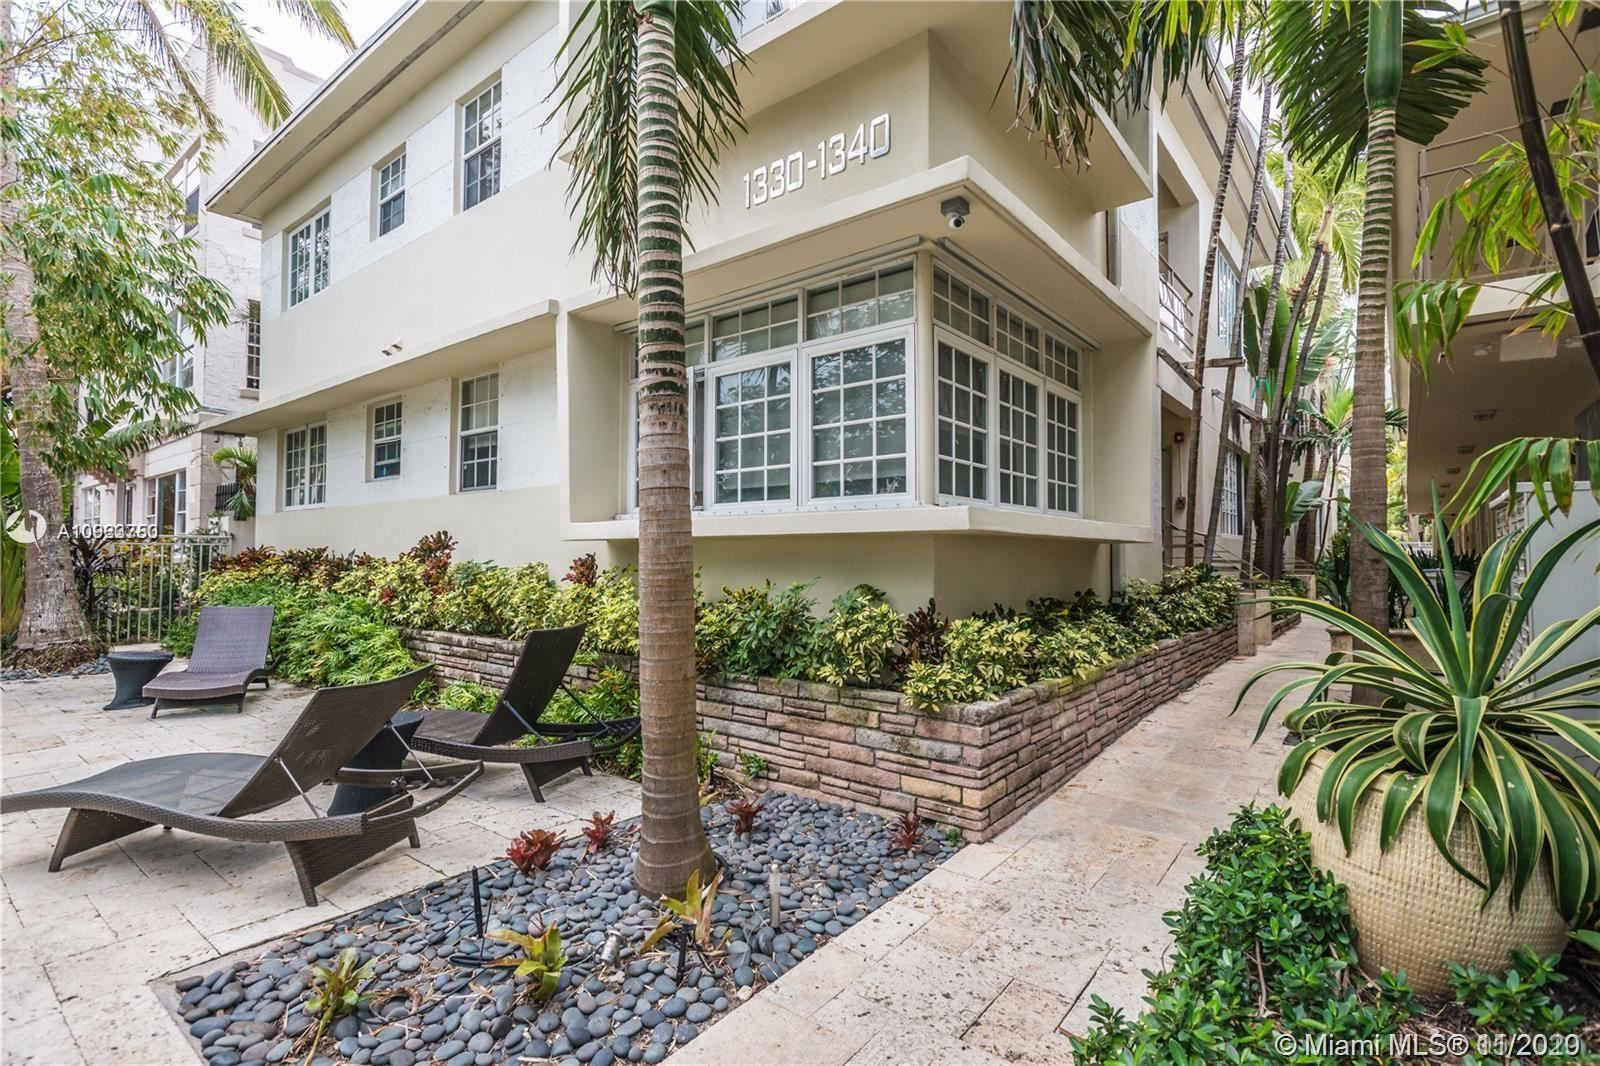 1340 Drexel Ave #305, Miami Beach, FL 33139 - #: A10923750